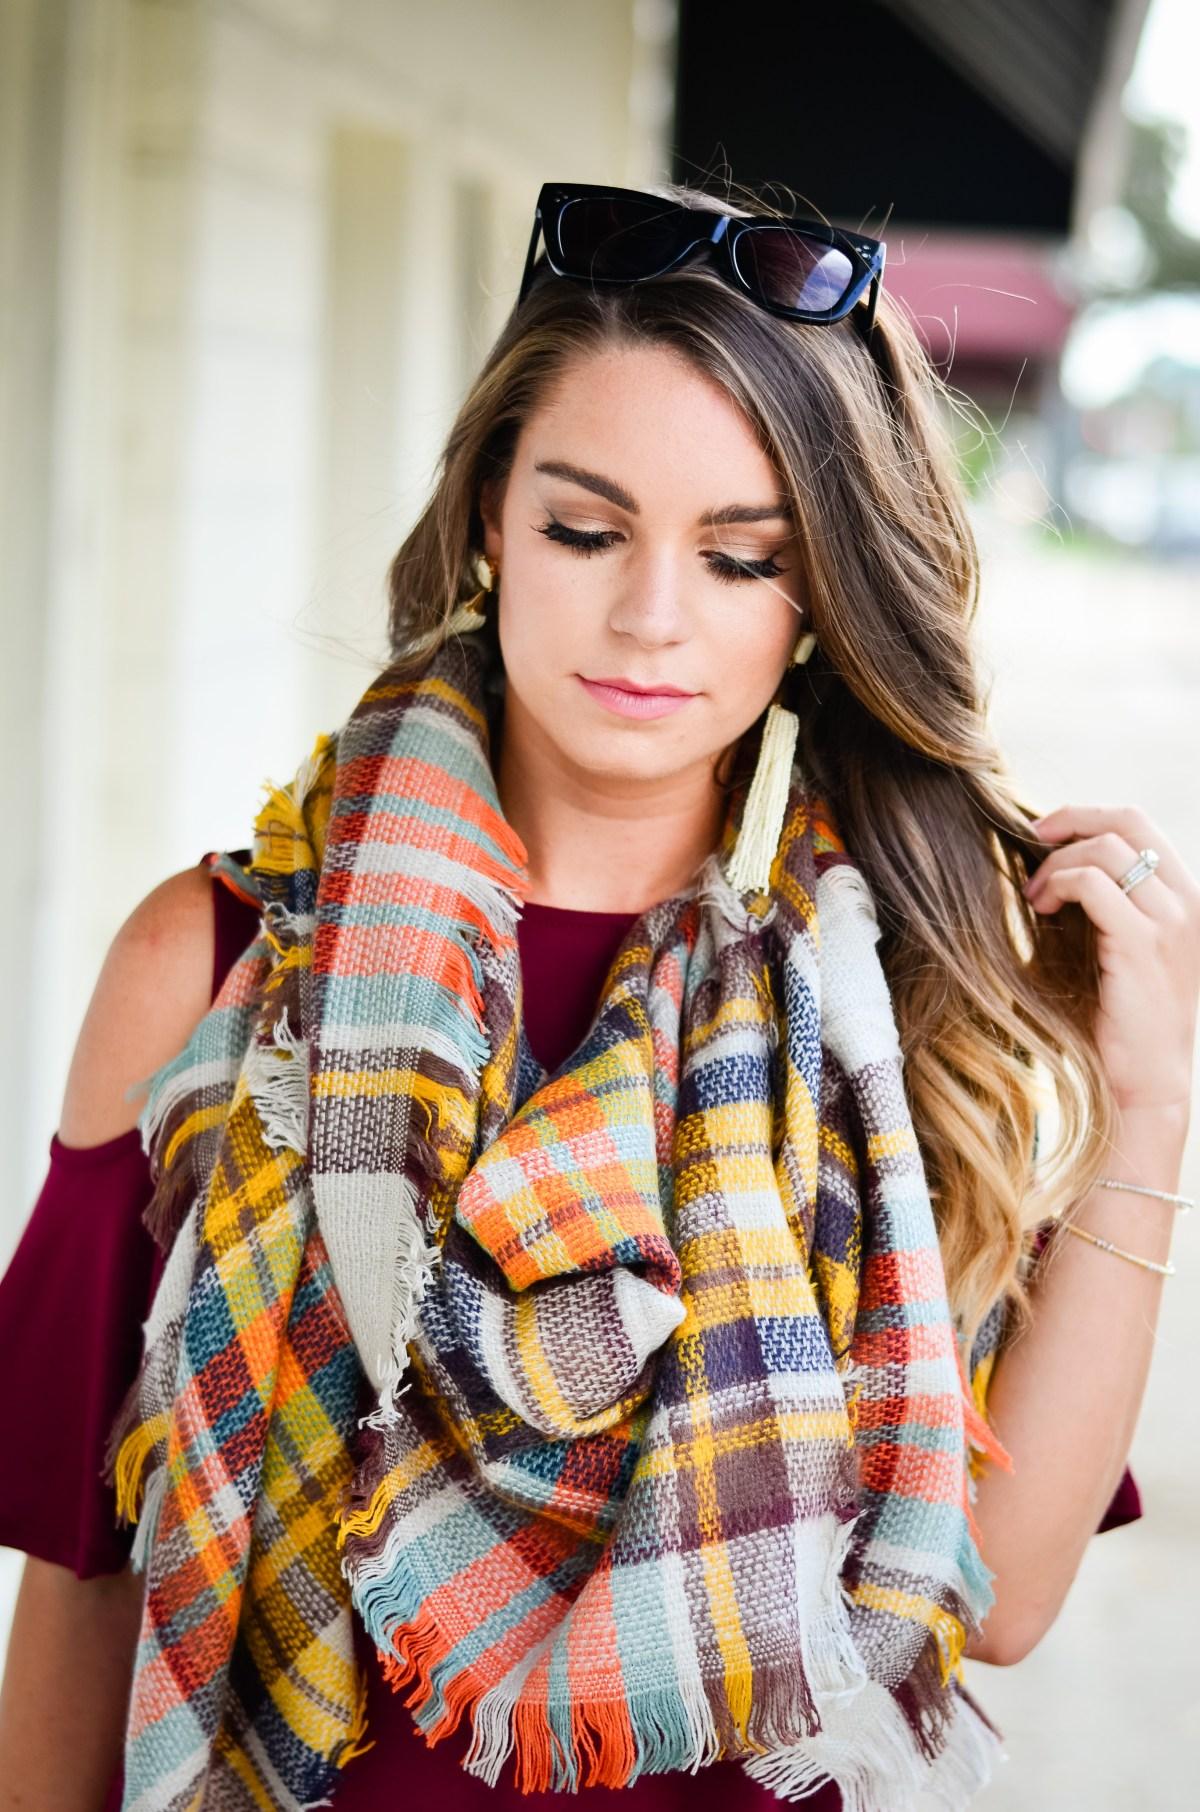 maroon-dress-blanket-scarf-goldfinch-23